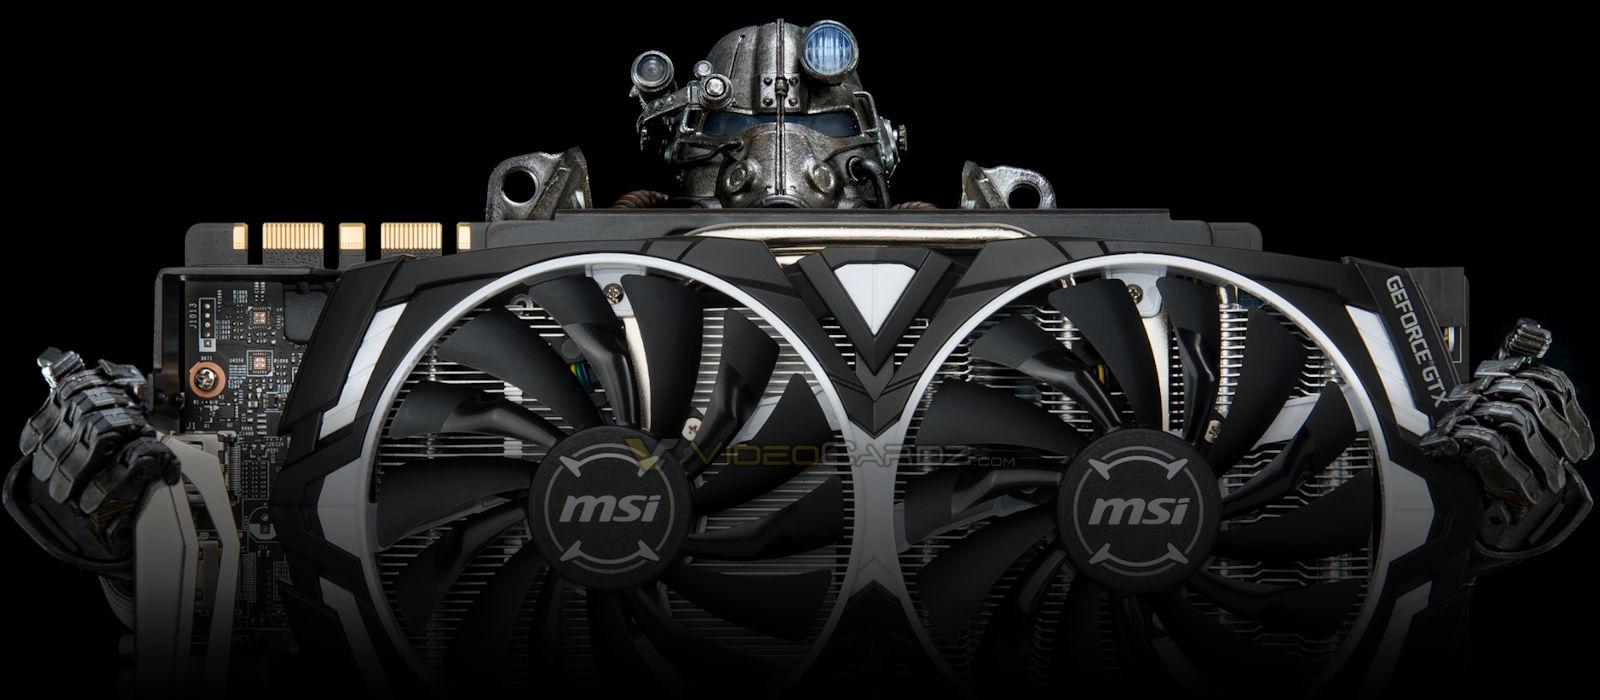 MSI GeForce GTX 1080 Ti ARMOR Review - VideoCardz com